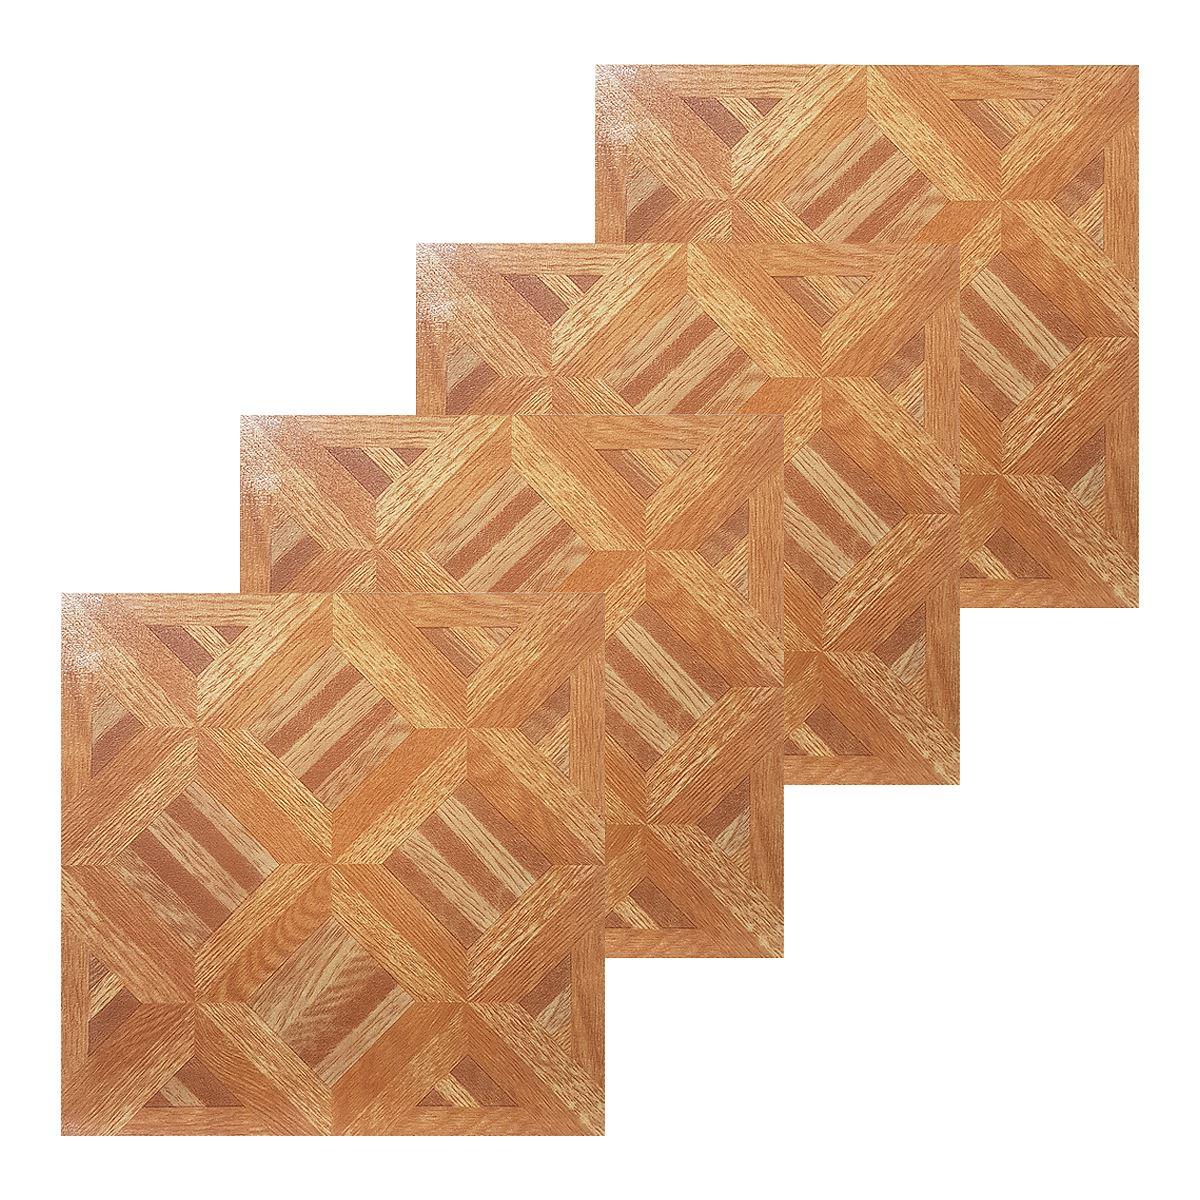 Floor Tiles Self Adhesive Wood Parquet Effect Vinyl